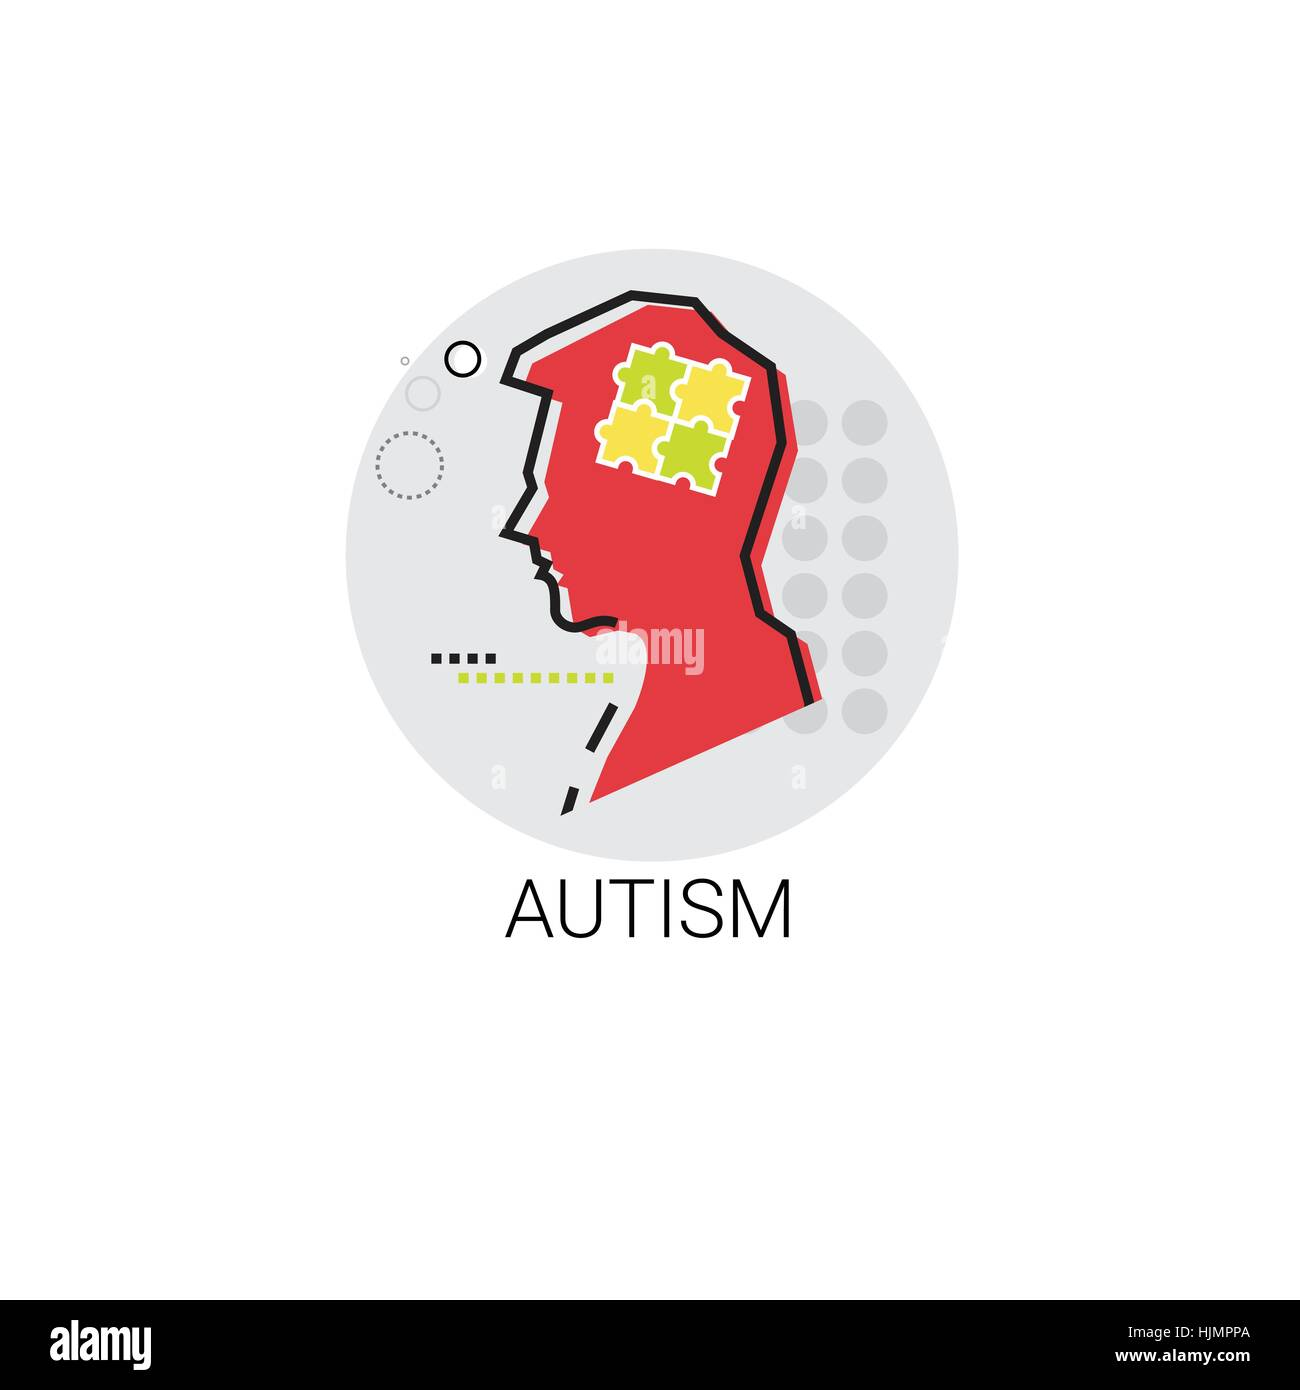 Autism Mental Health Brain Activity Icon - Stock Vector